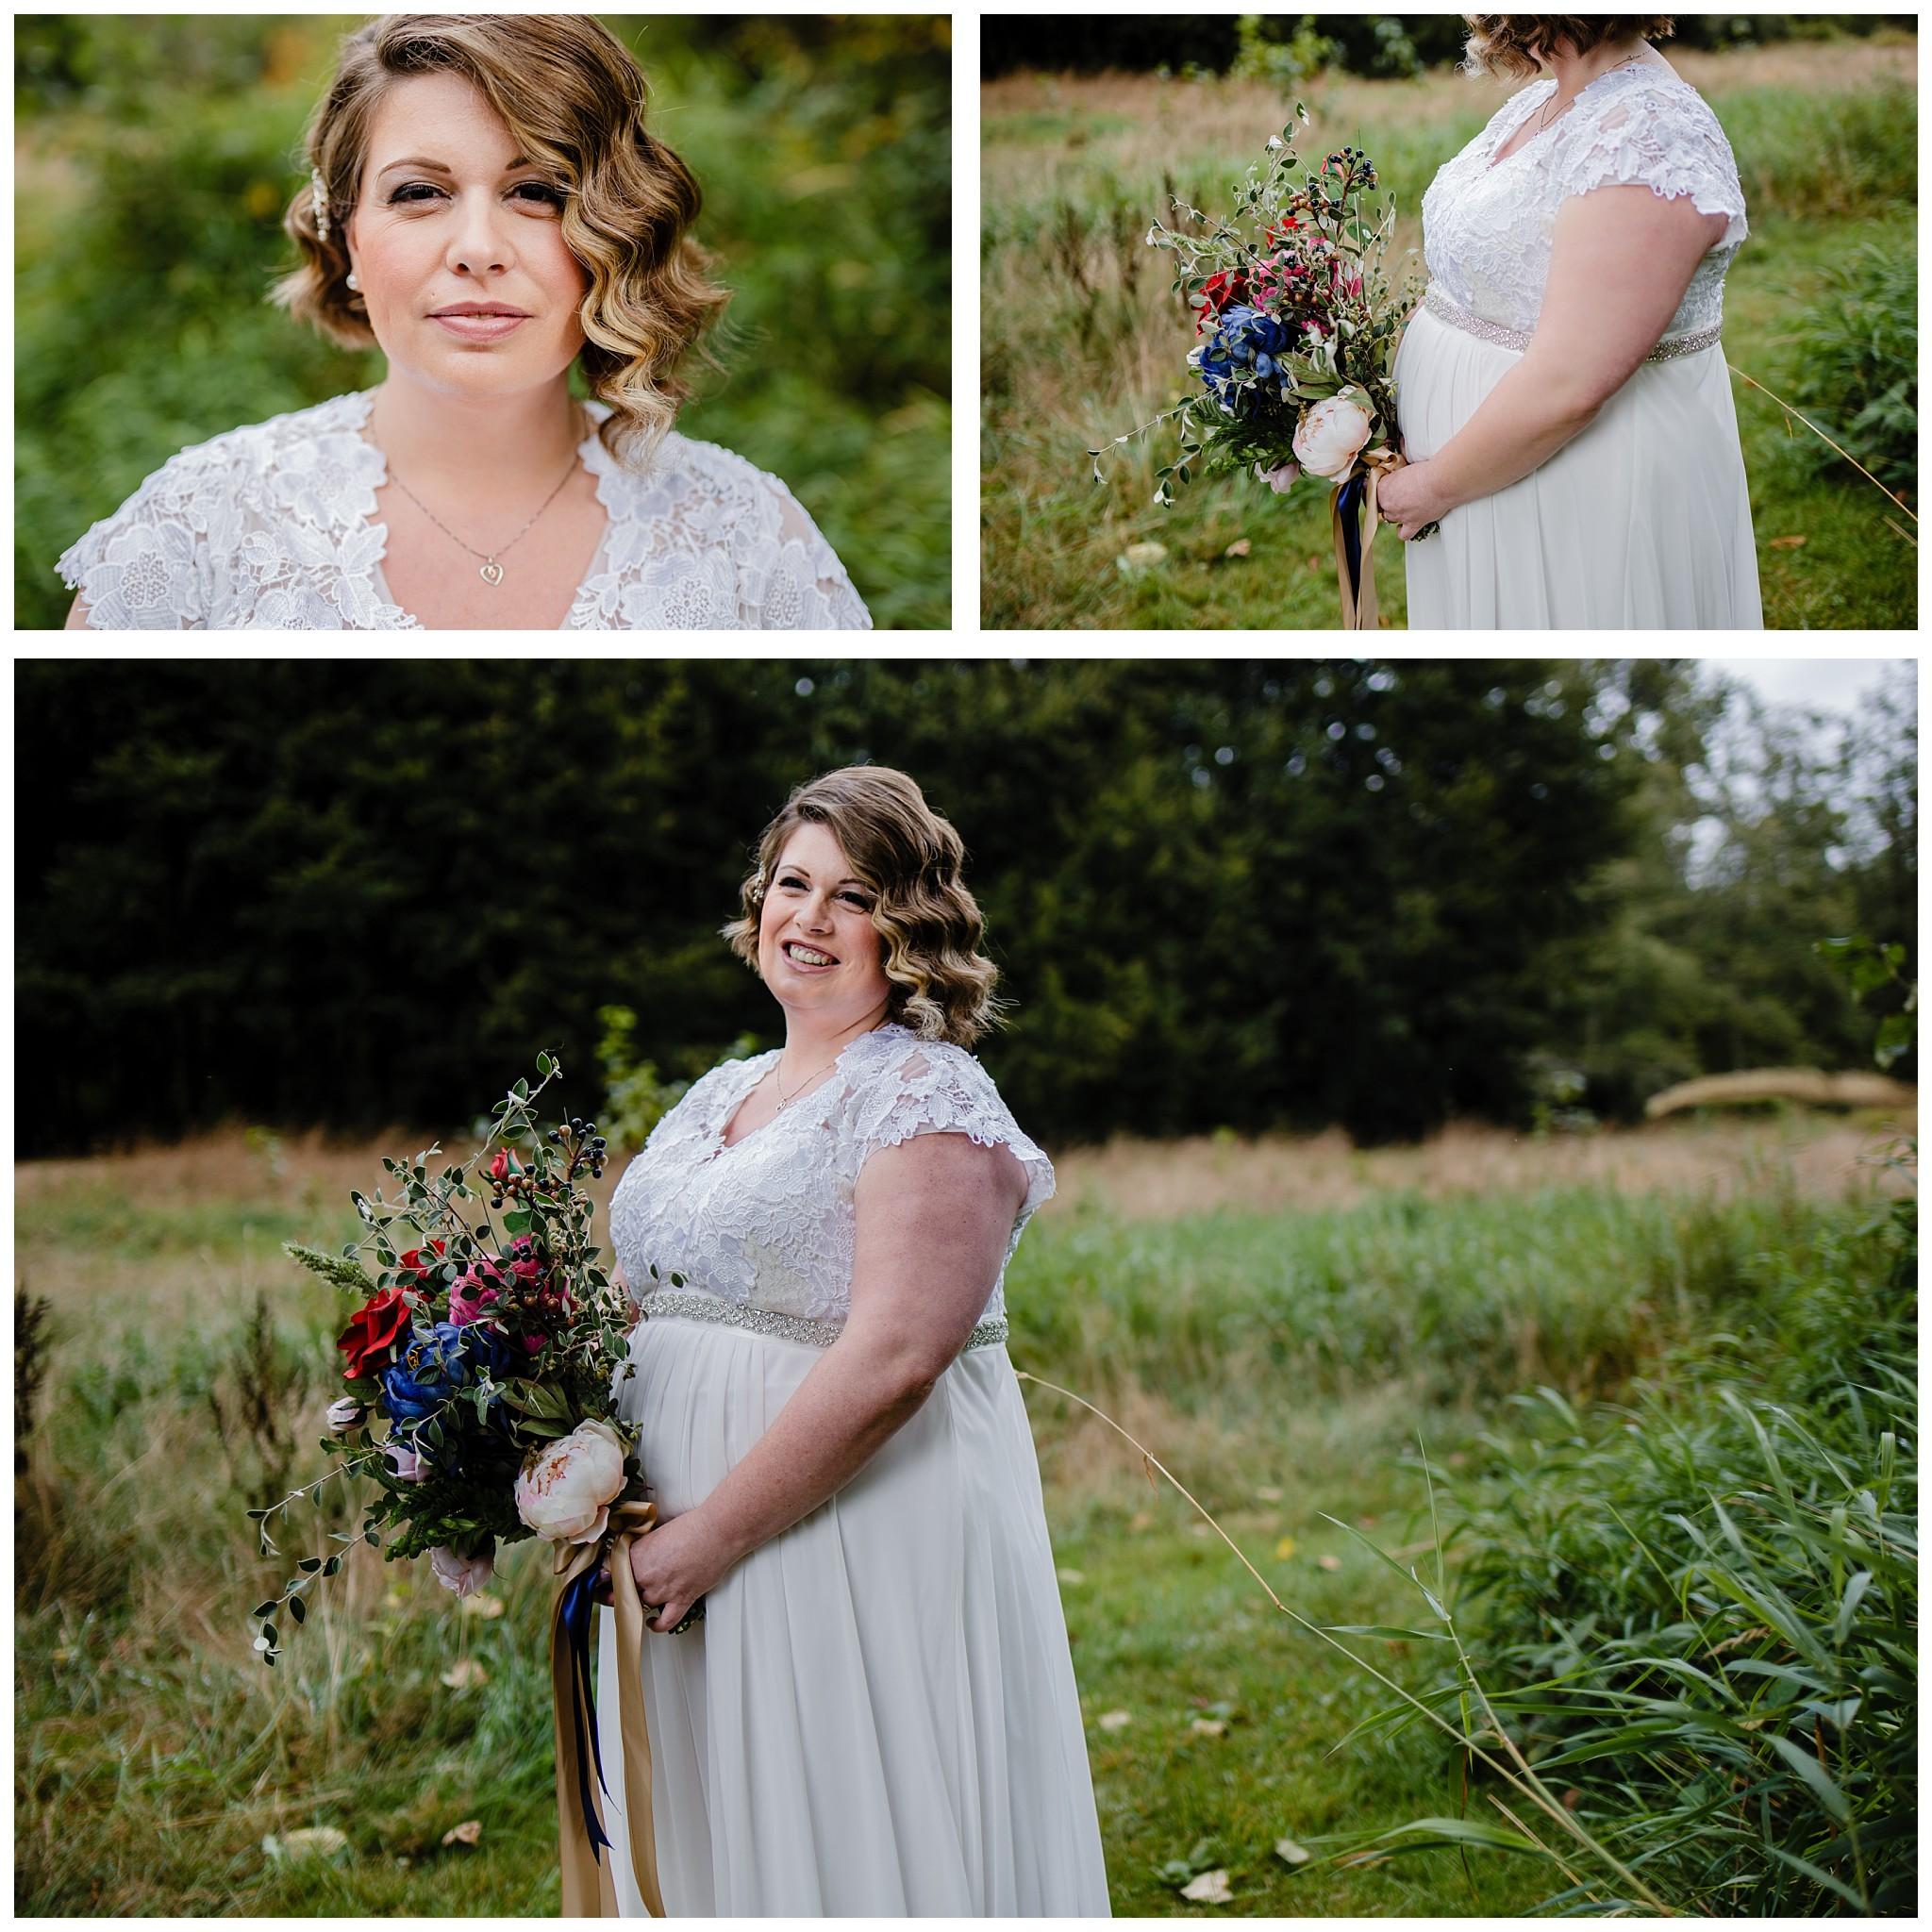 Aldergrove Park Fall Backyard Wedding Photographer Pregnant Bride Tent Outdoor BC Canada Best Wedding Photographer_0026.jpg